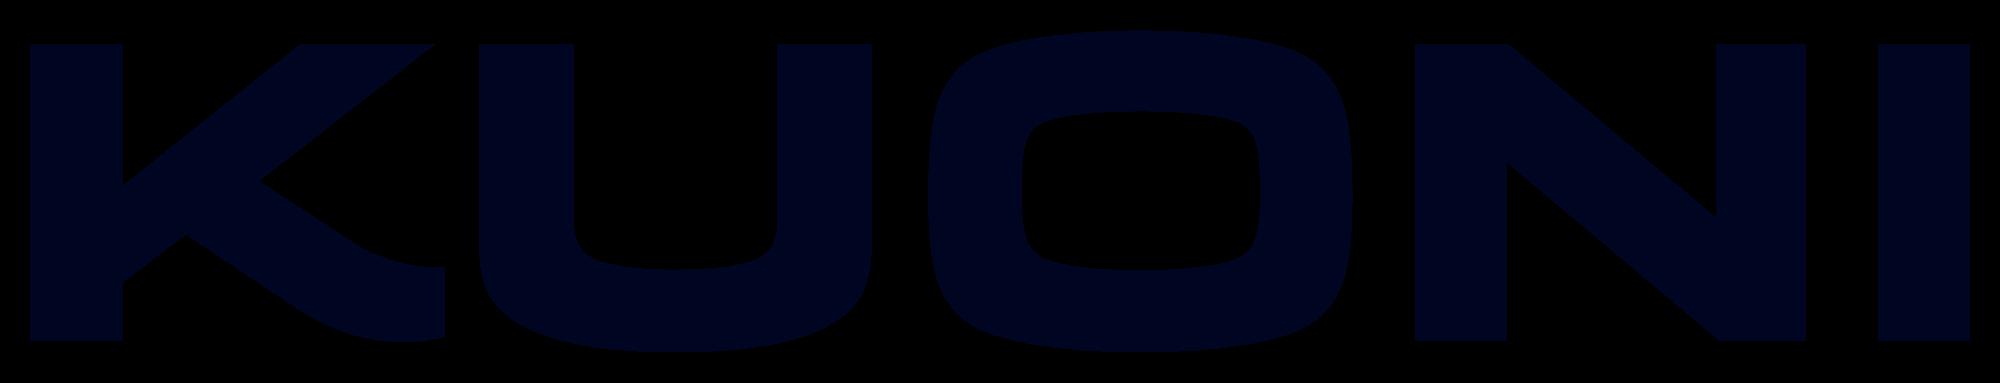 kuoni_logo.png